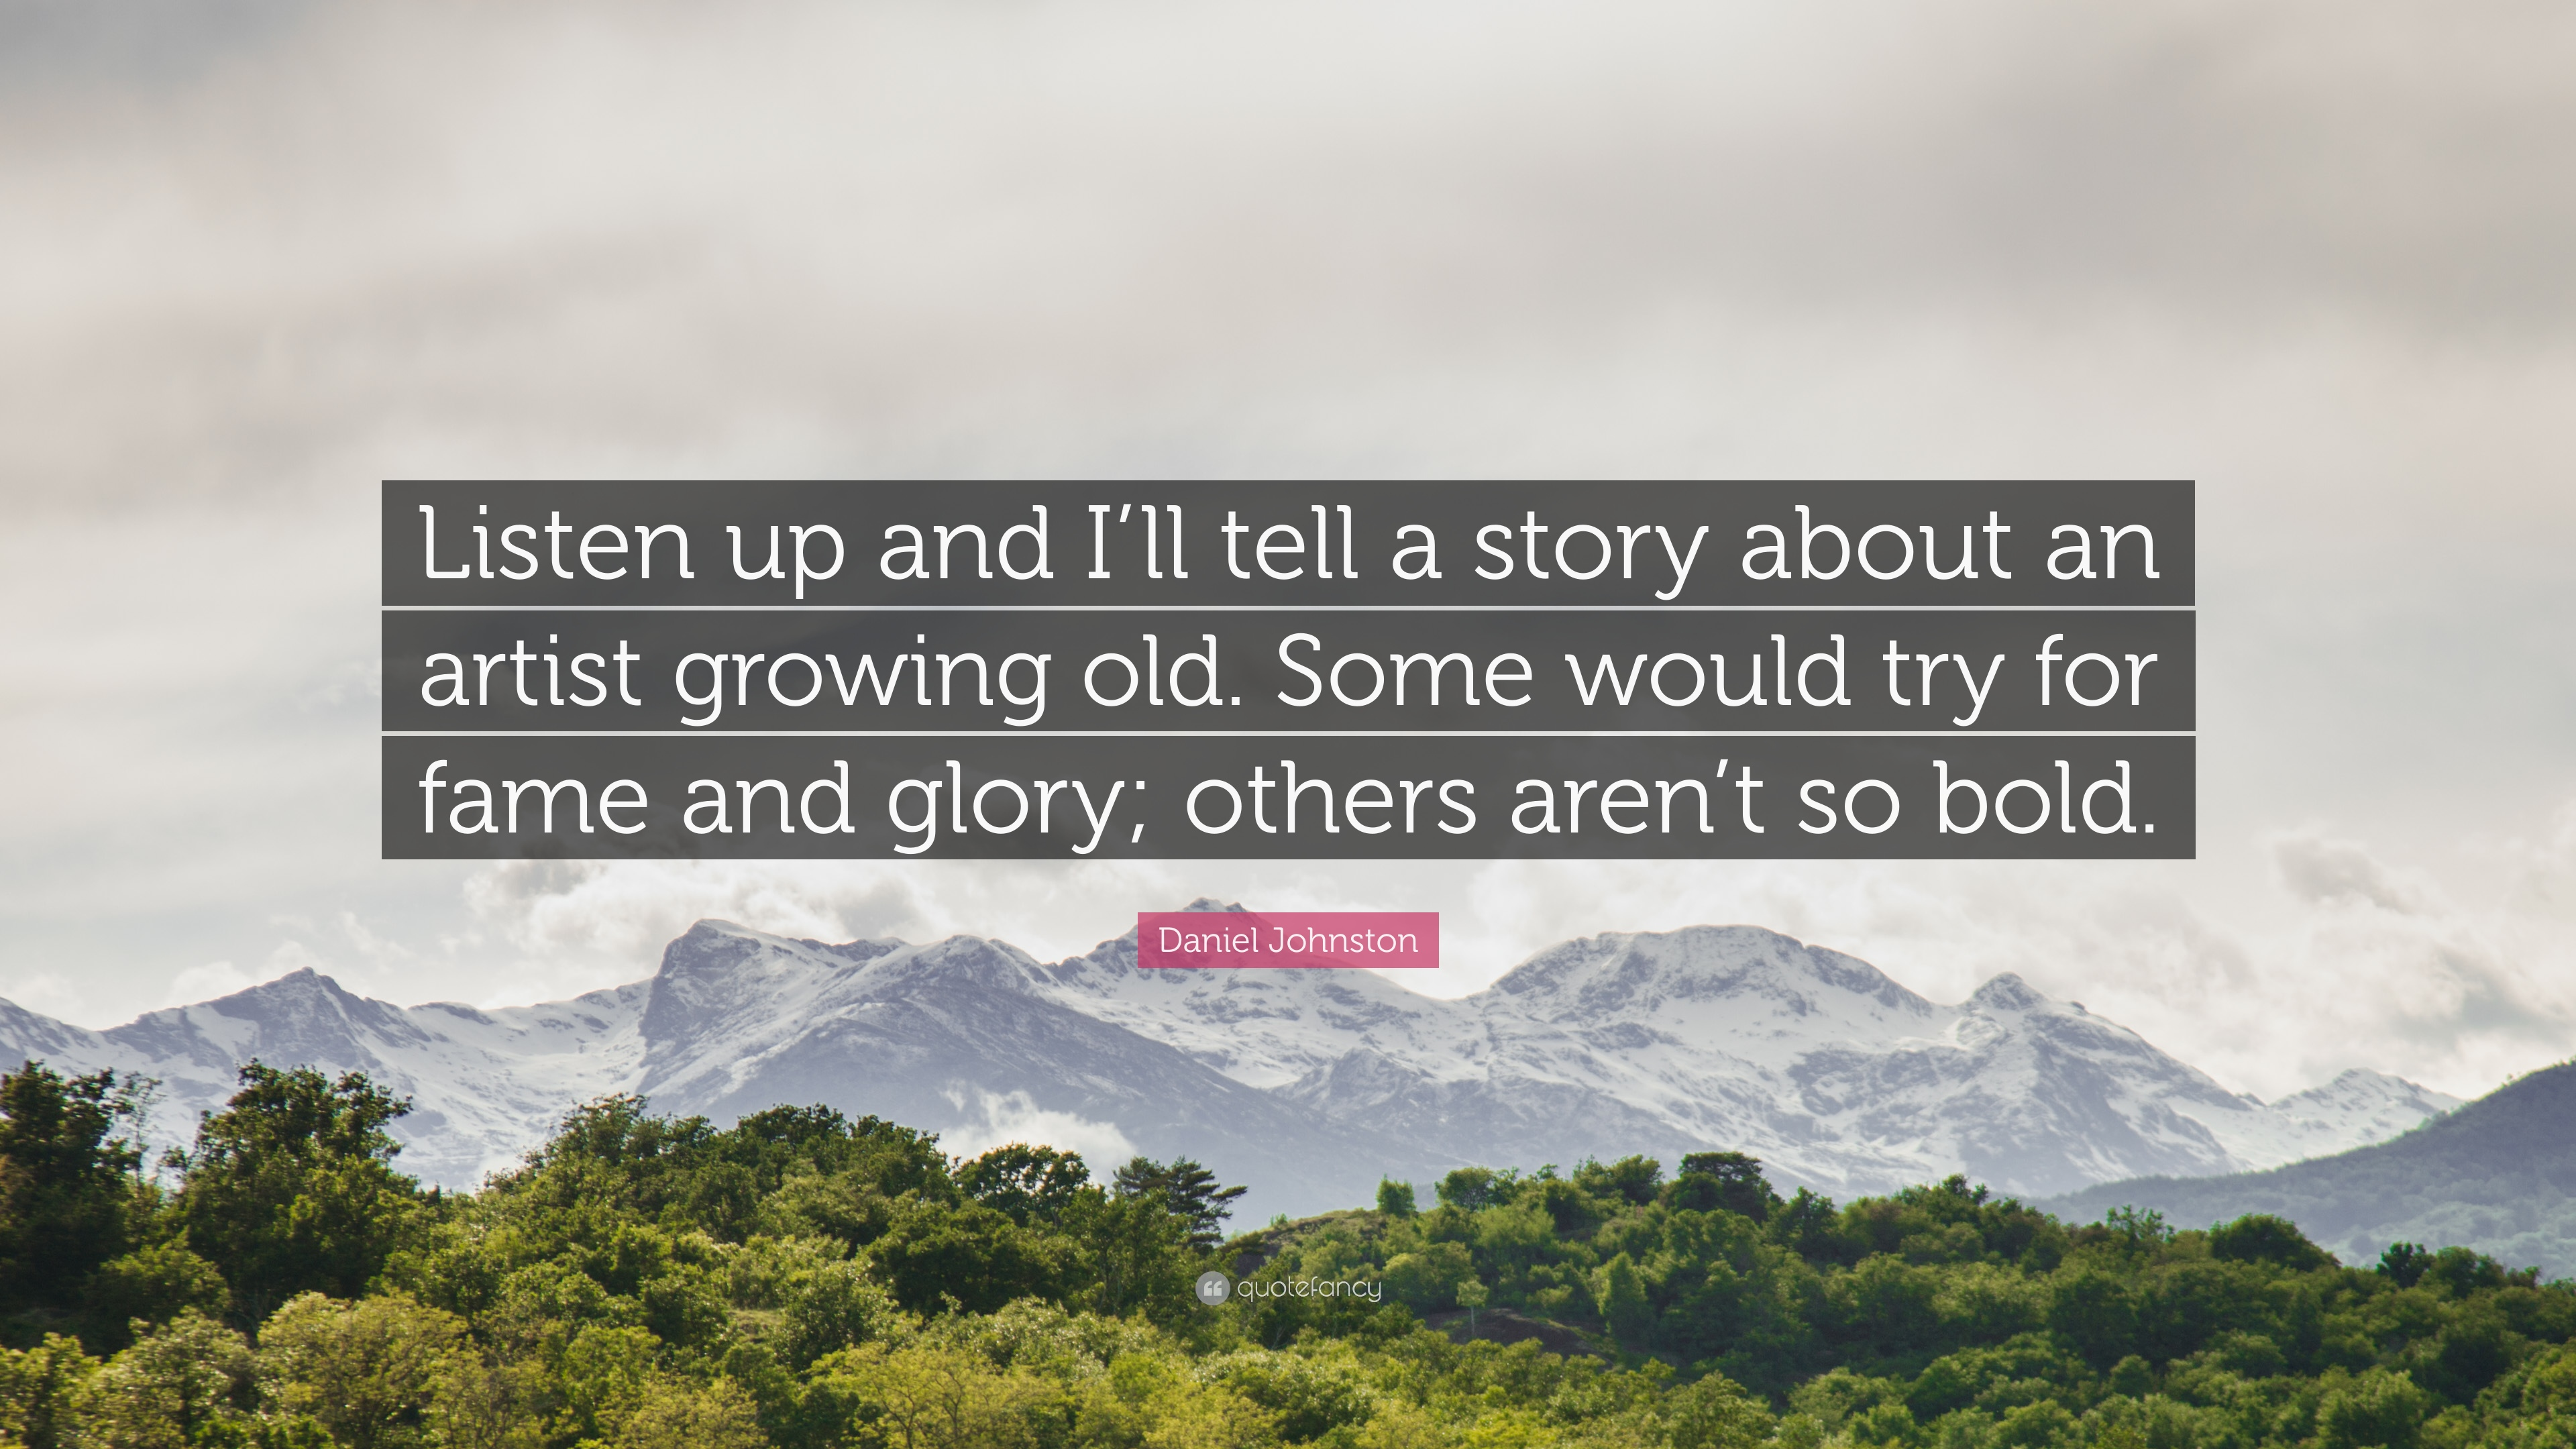 i tell a story